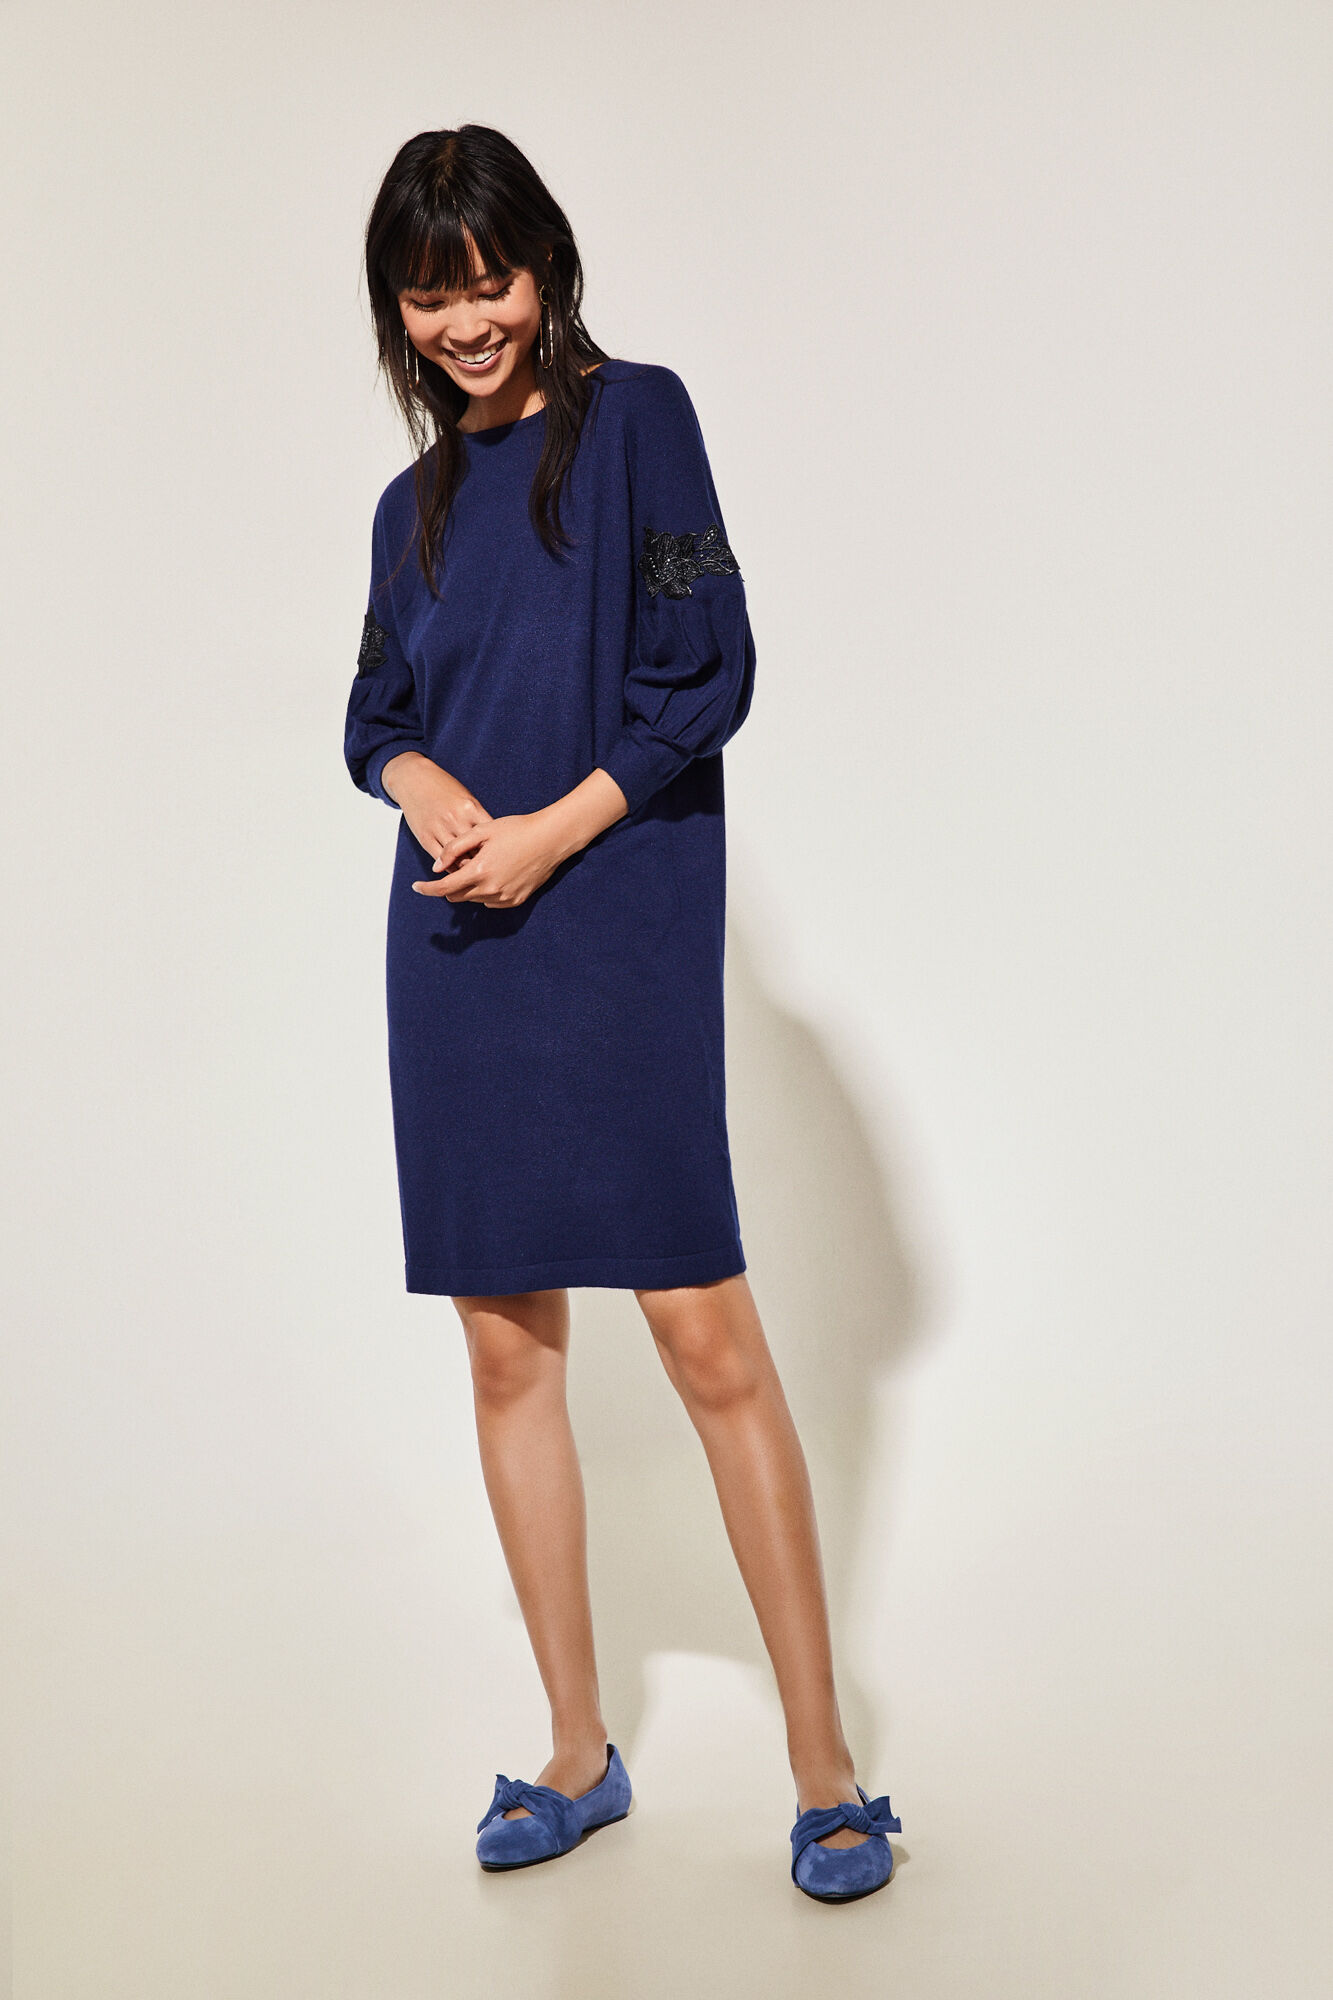 Vestido ibicenco azul